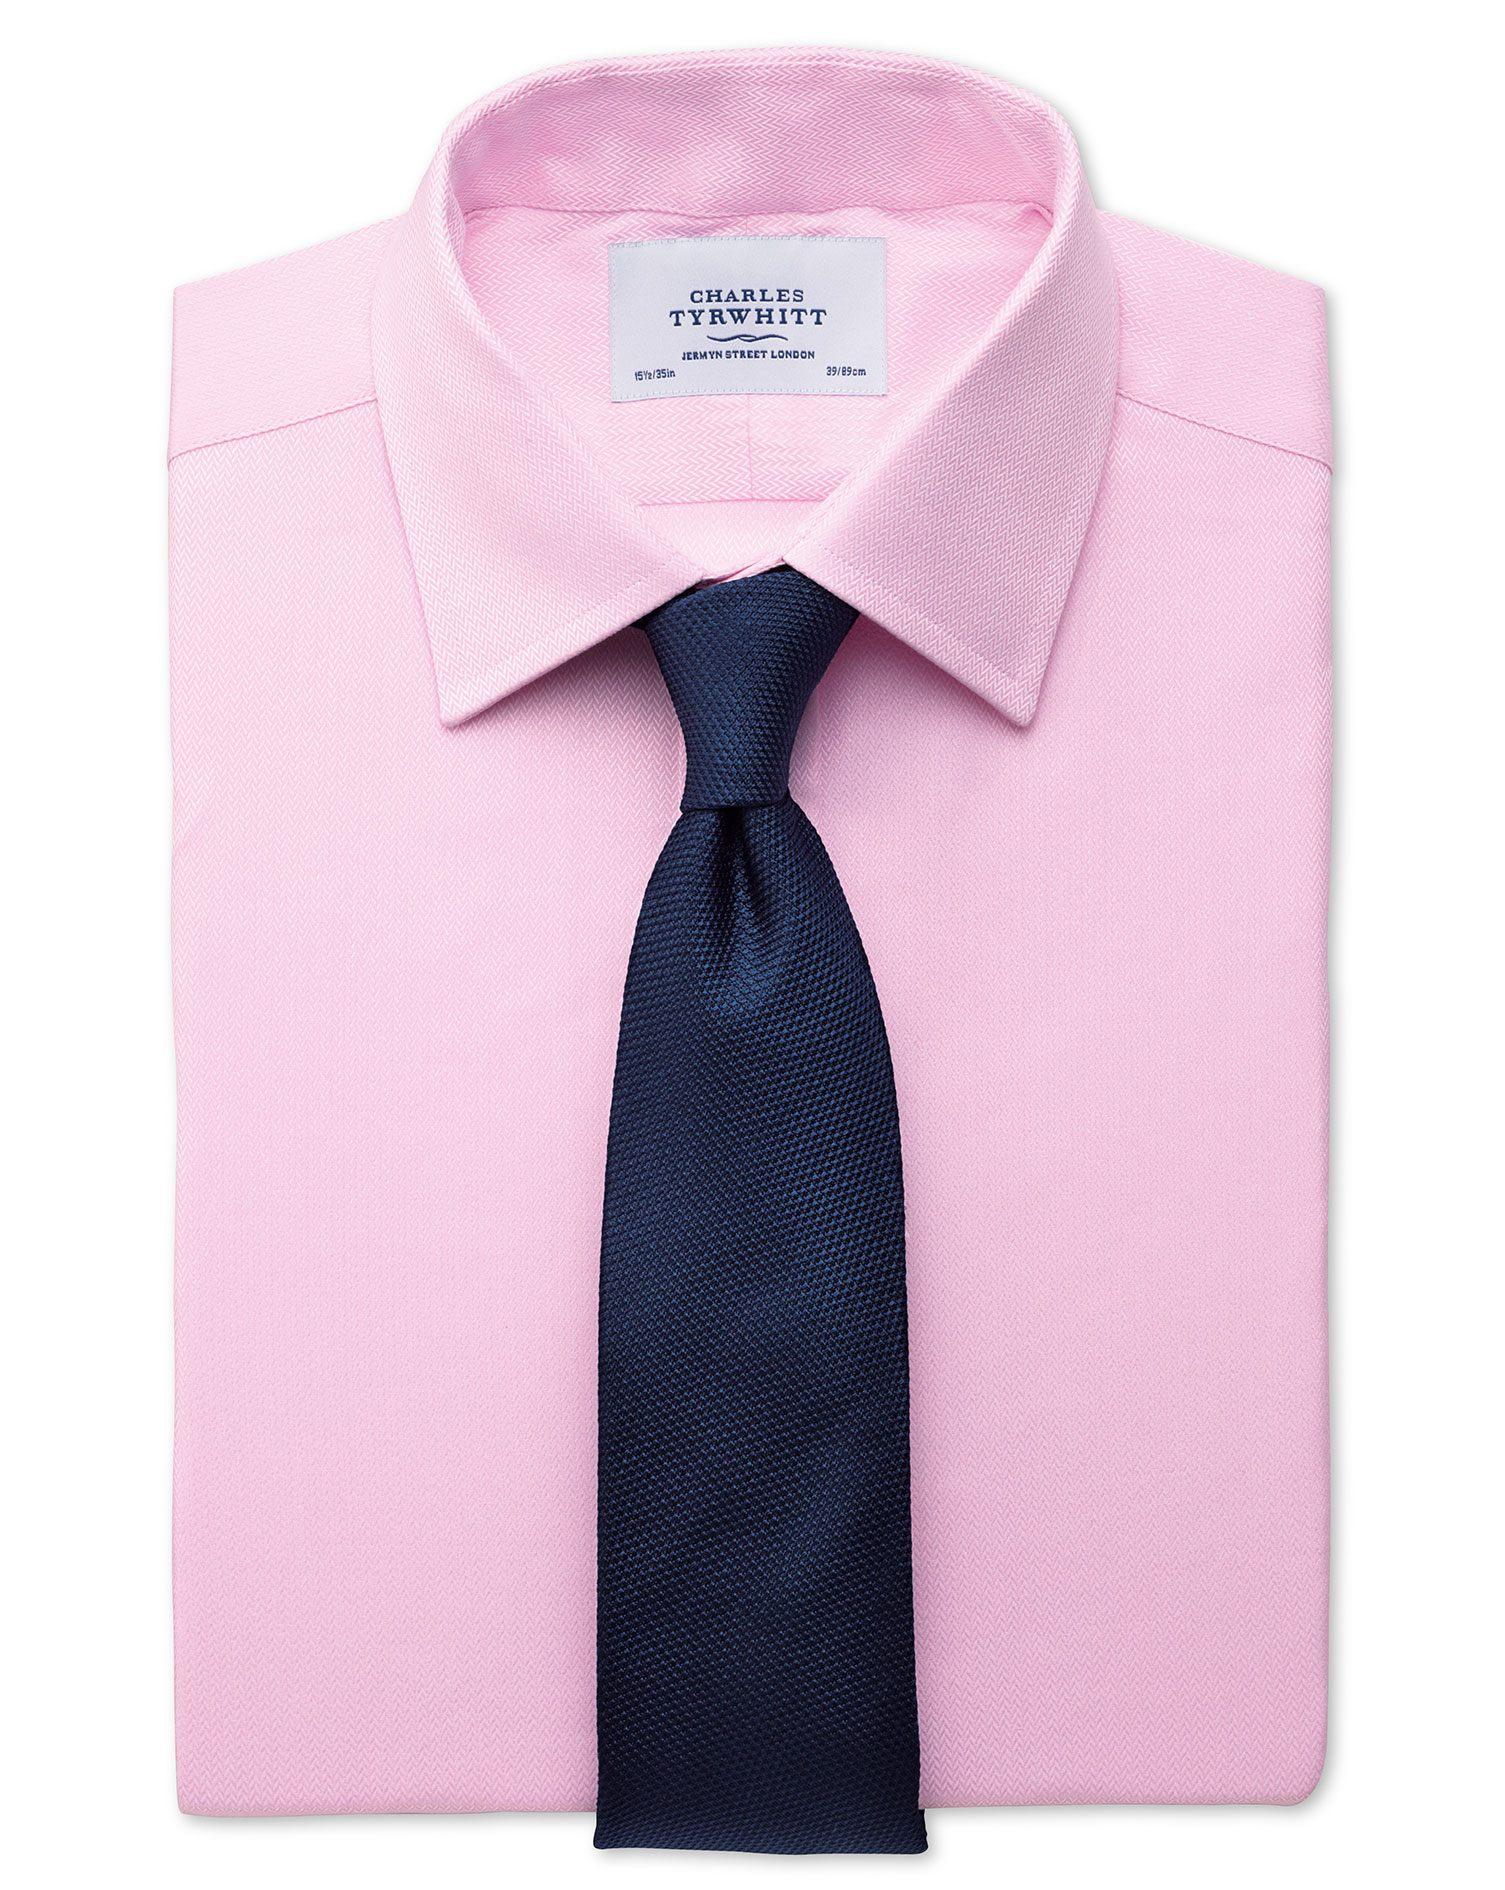 Slim Fit Small Herringbone Pink Cotton Formal Shirt Single Cuff Size 15/34 by Charles Tyrwhitt